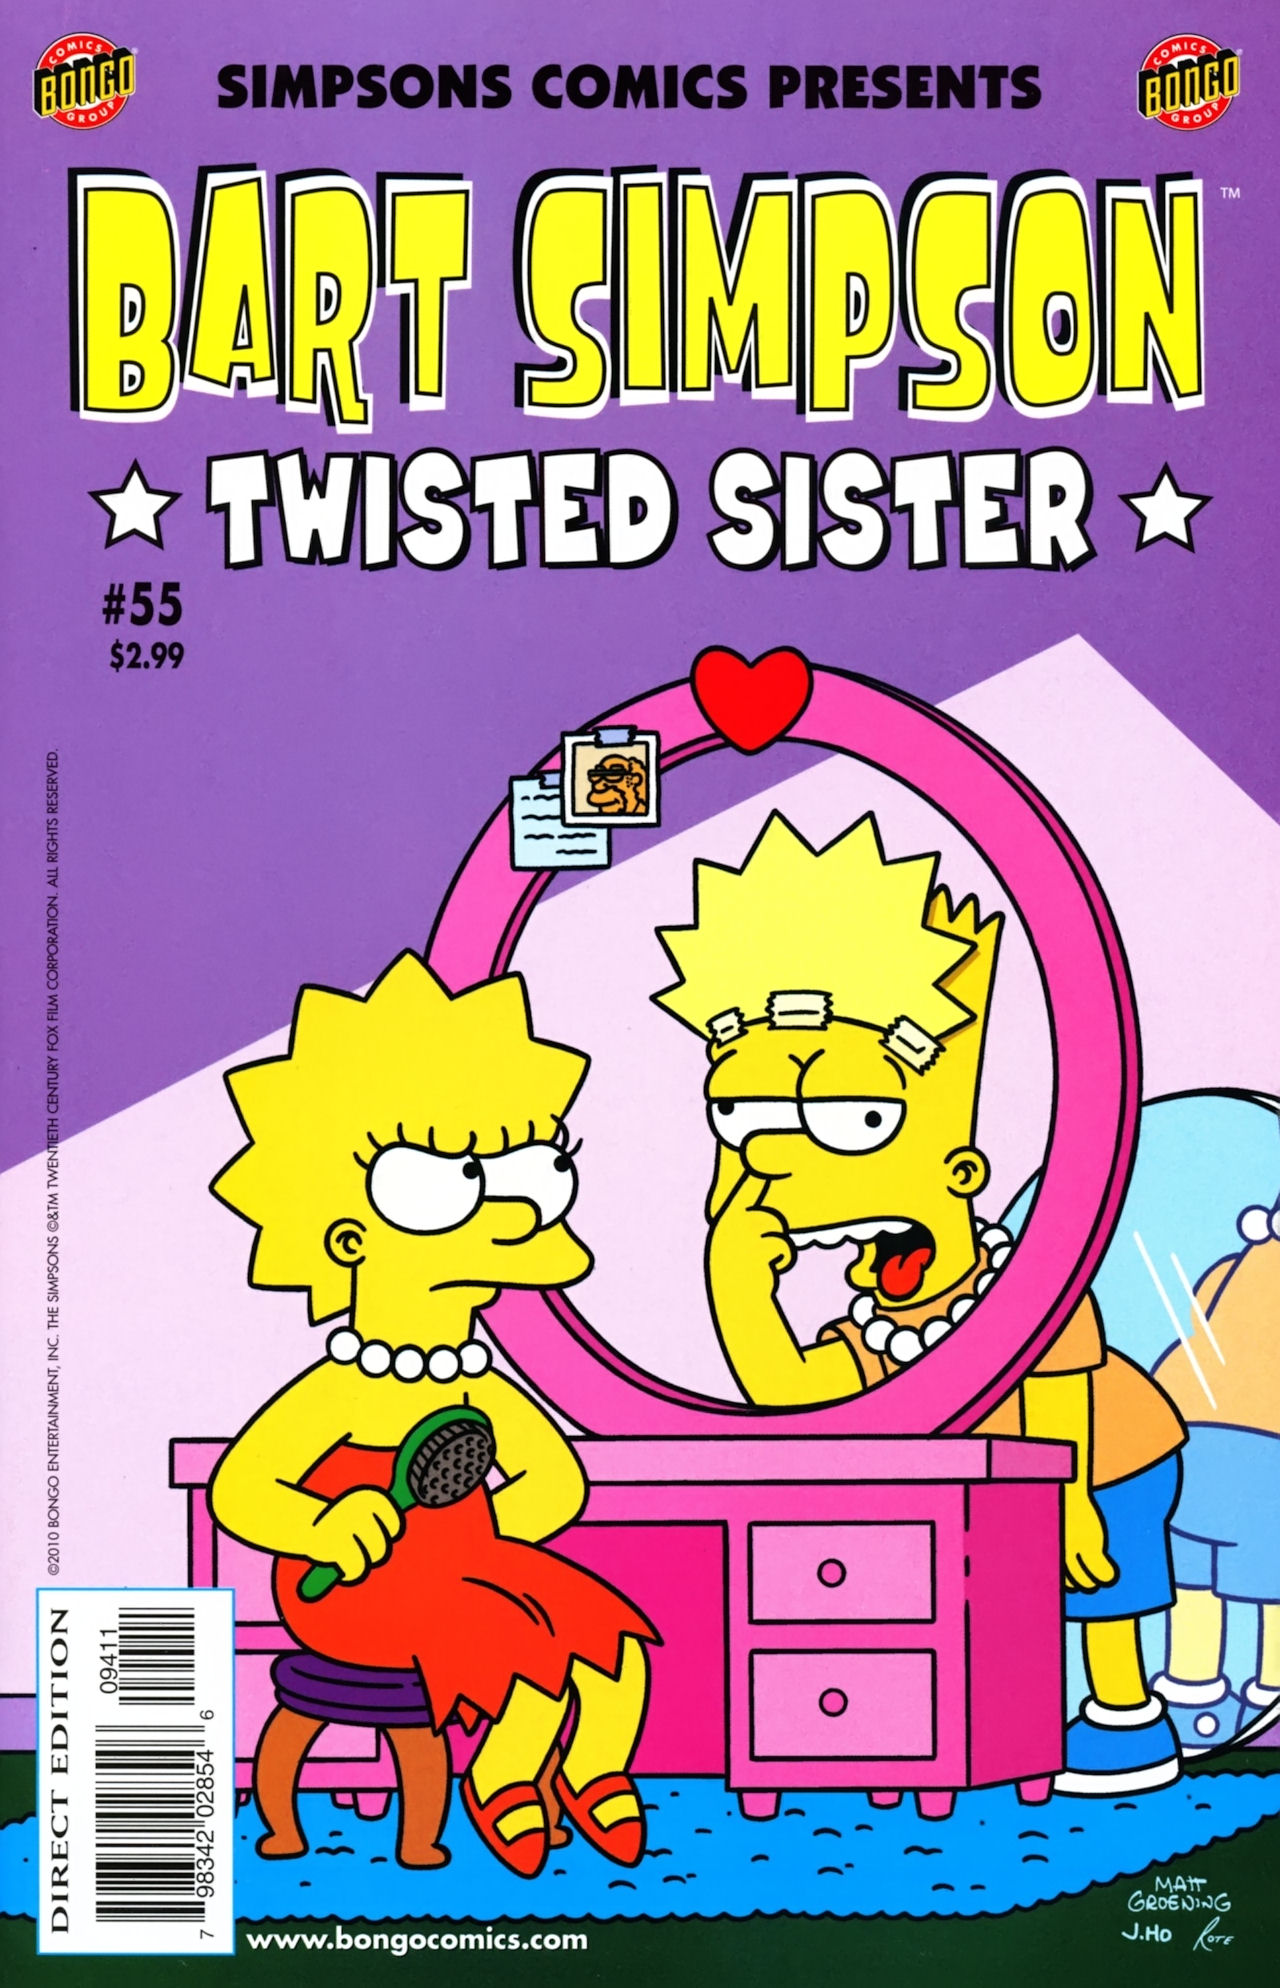 Read online Simpsons Comics Presents Bart Simpson comic -  Issue #55 - 1